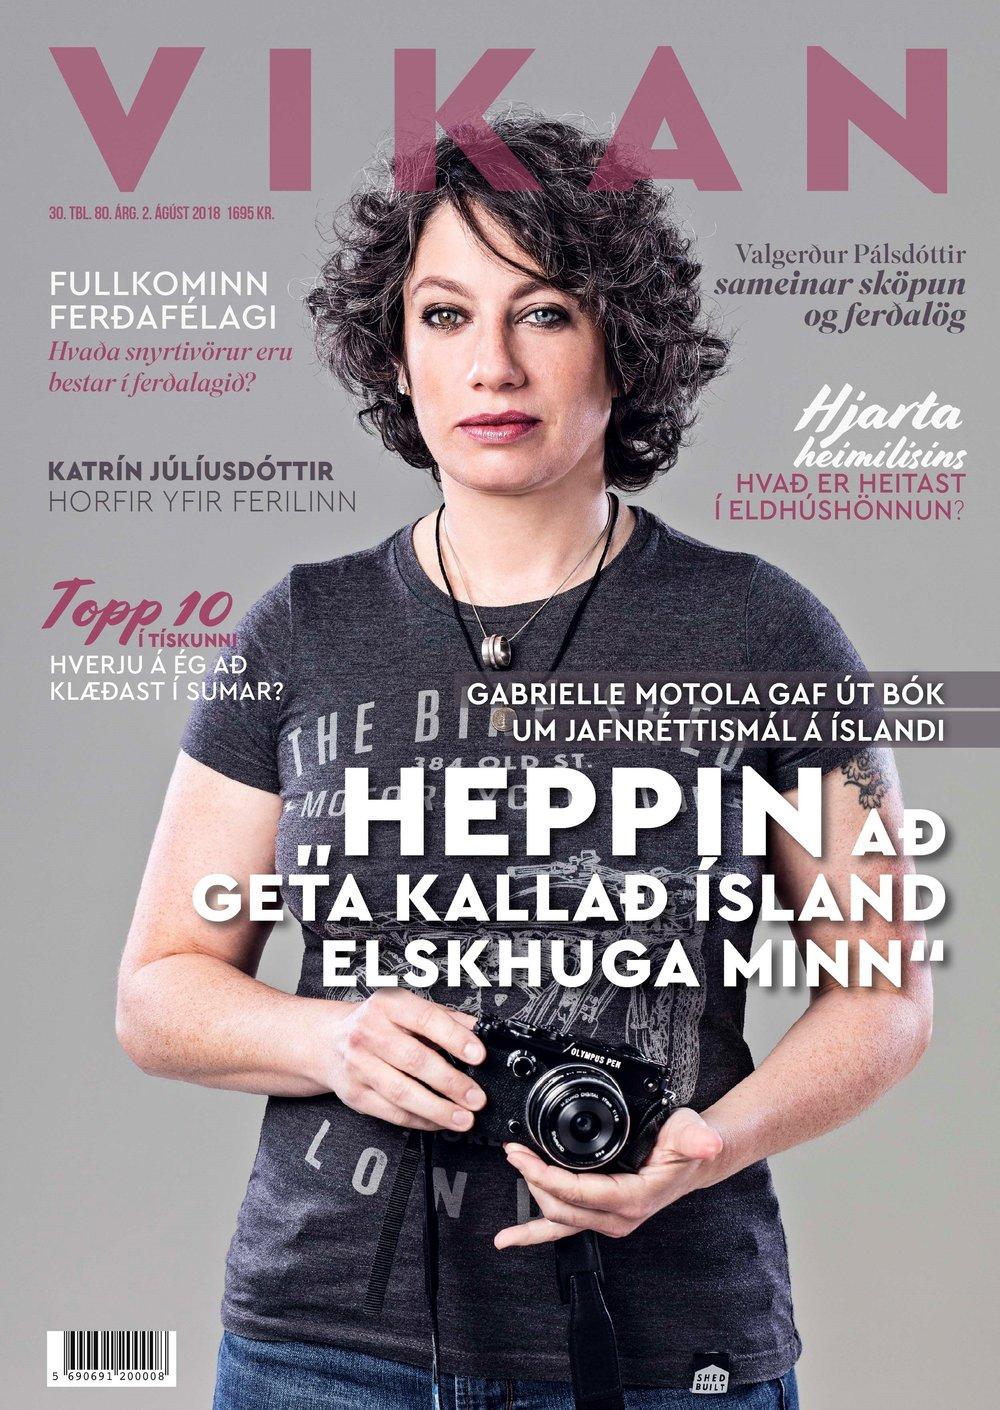 Interview in Vikan Magazine (Icelandic)